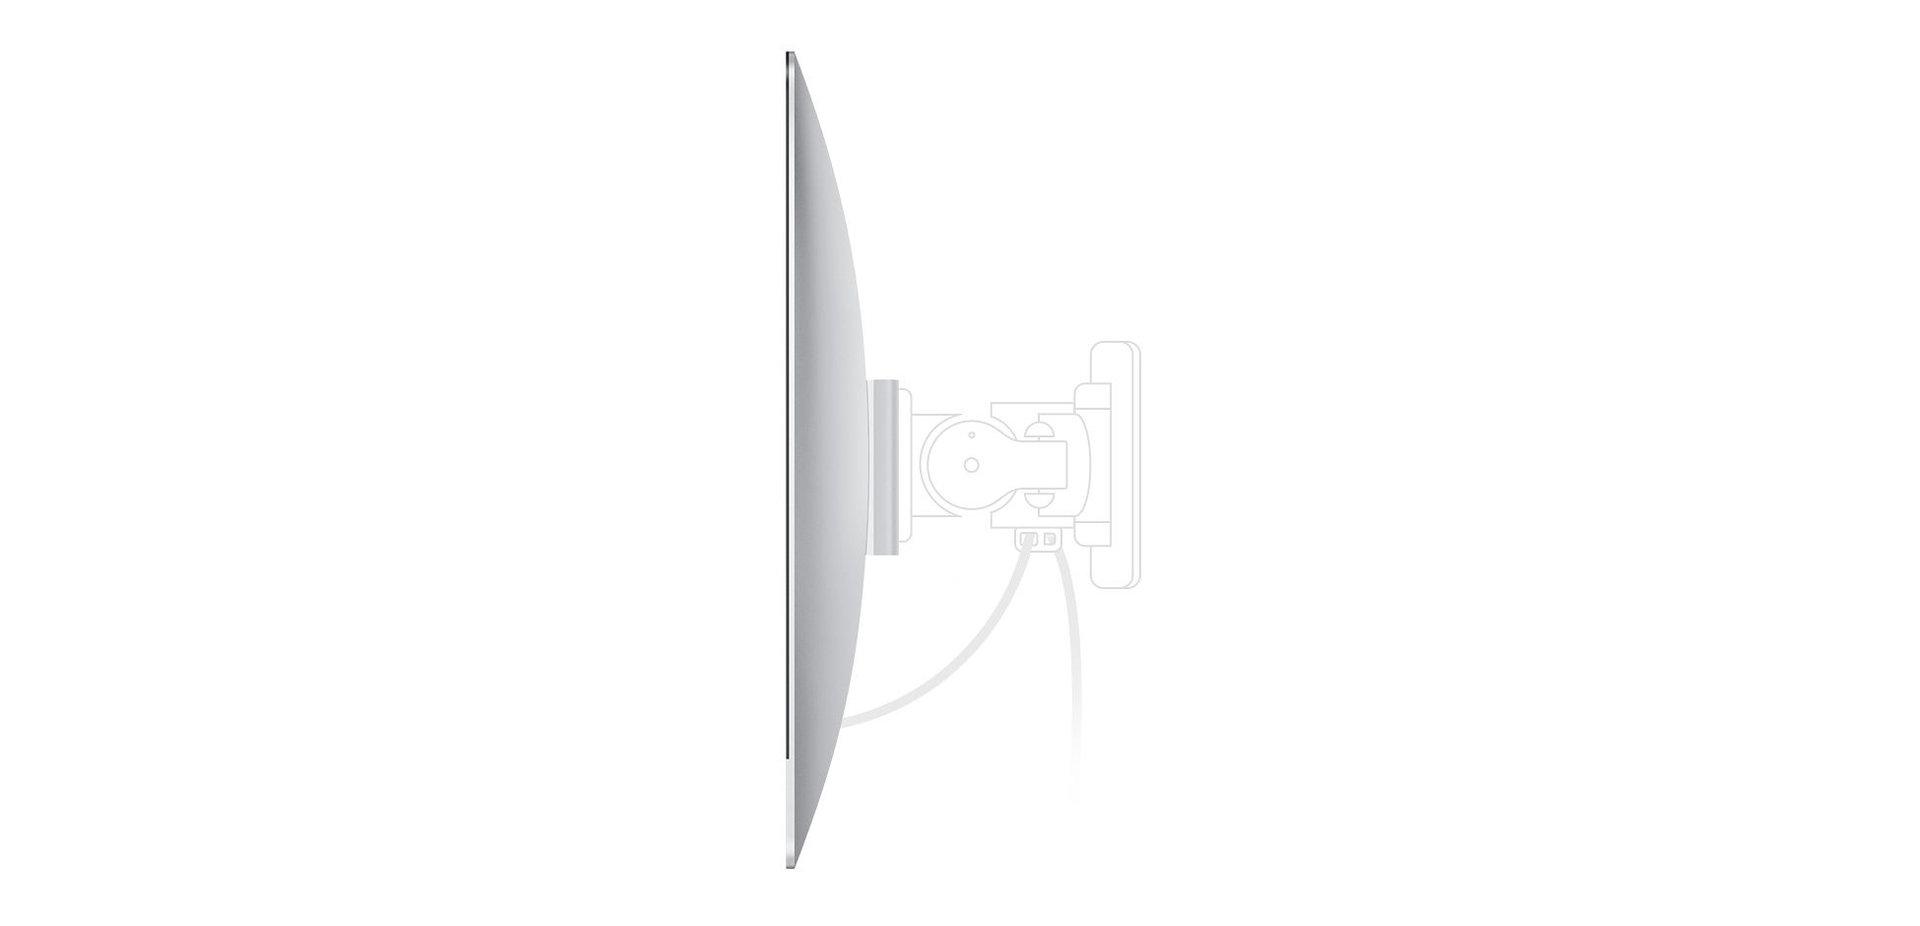 iMac mit VESA-Mount-Adapter